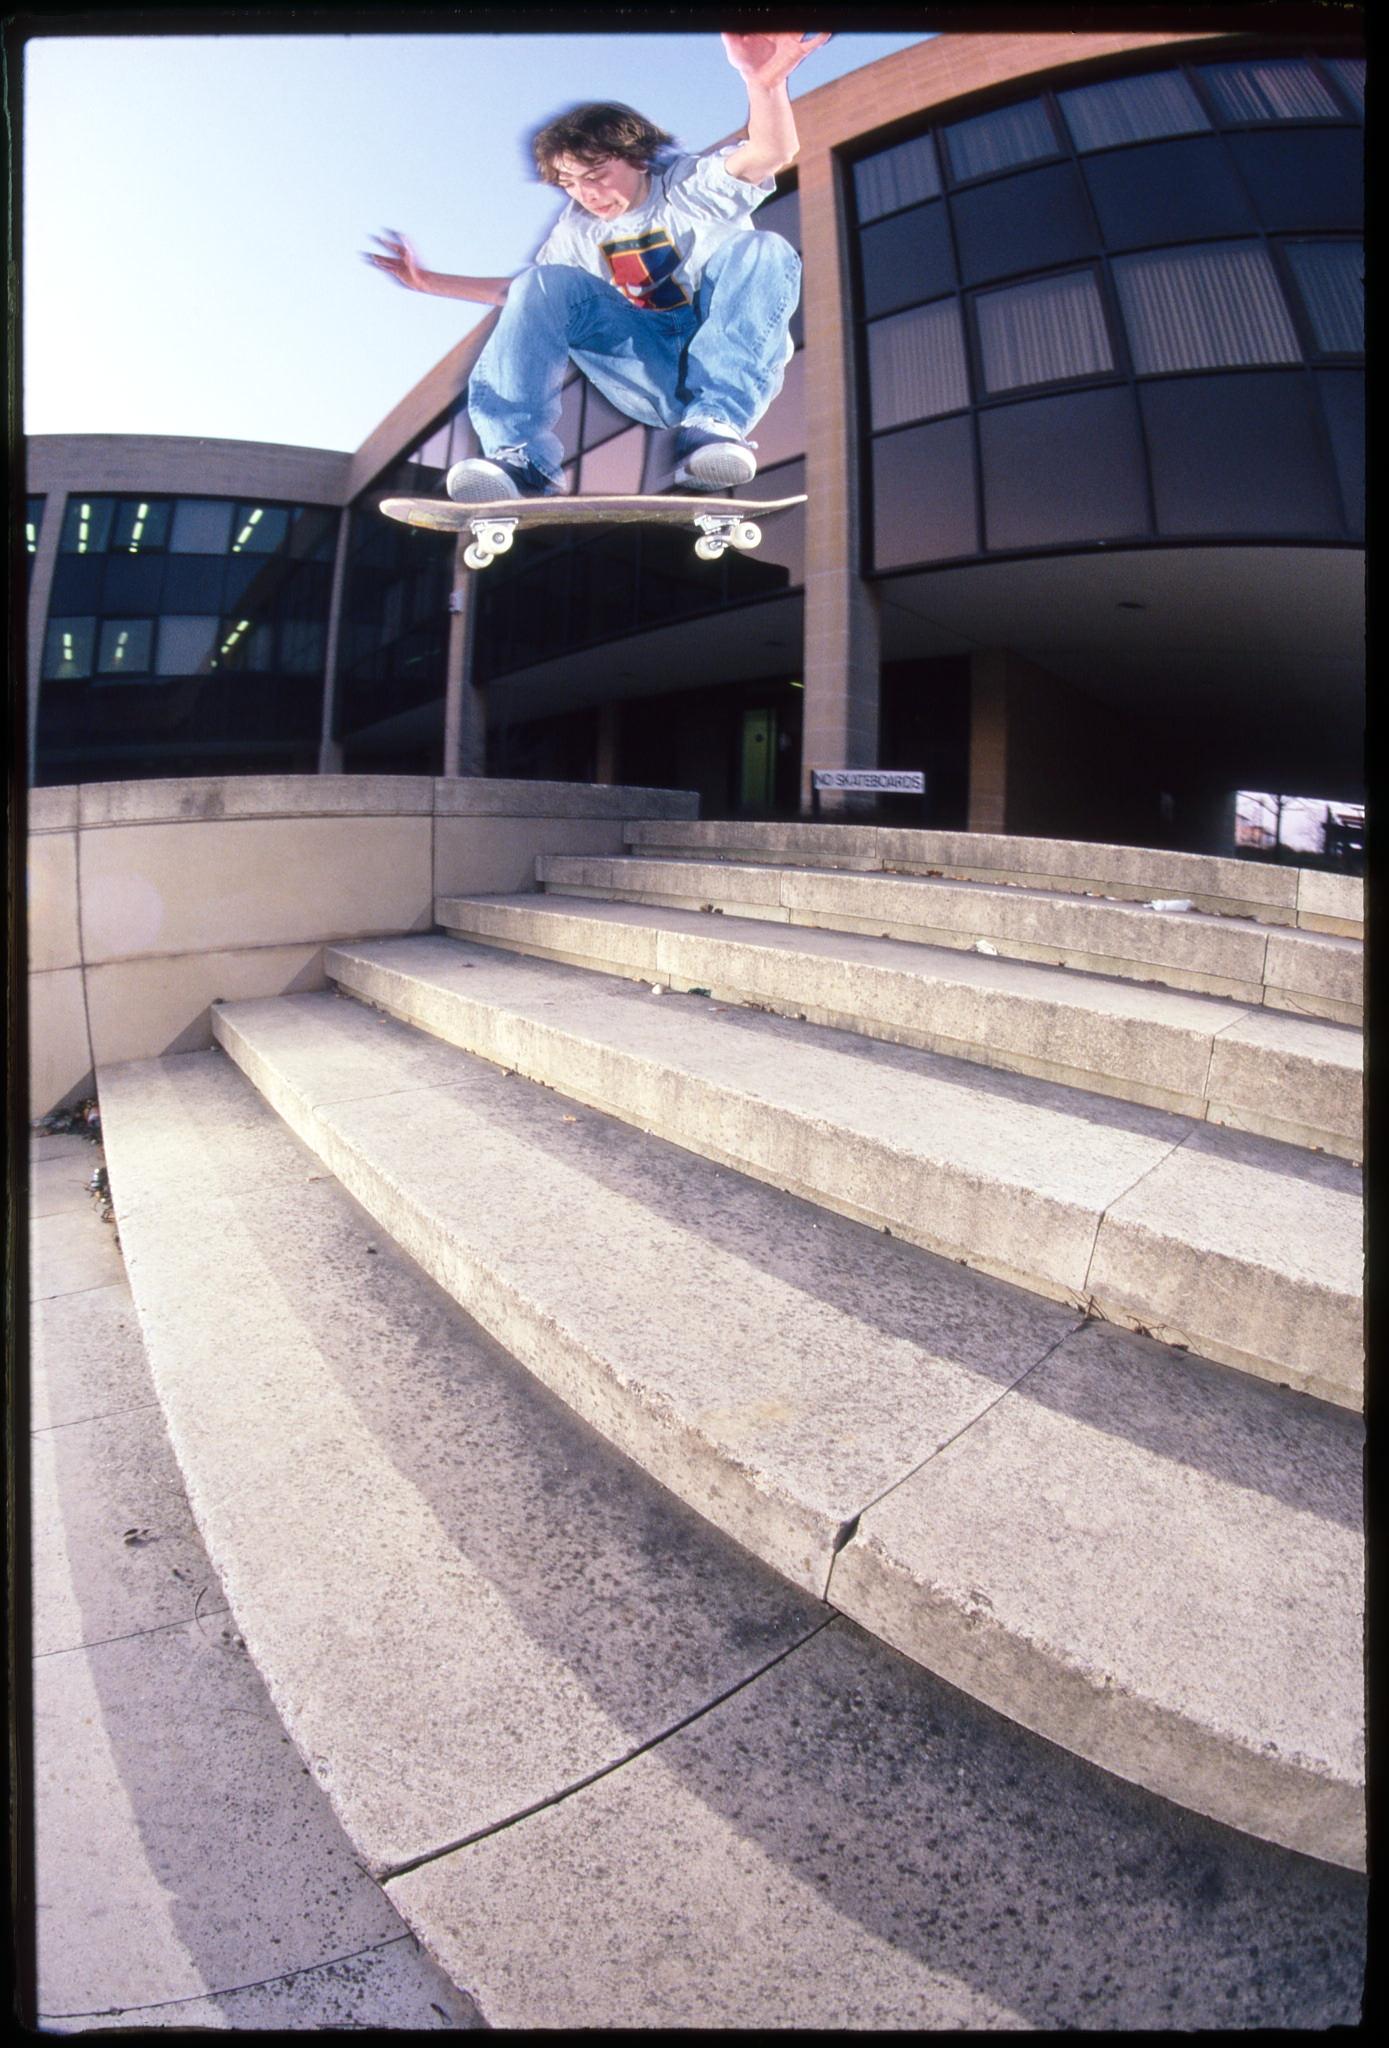 Mark Baines, switch frontside kickflip, The Beige, Milton Keynes, 1996. photo: Wig Worland